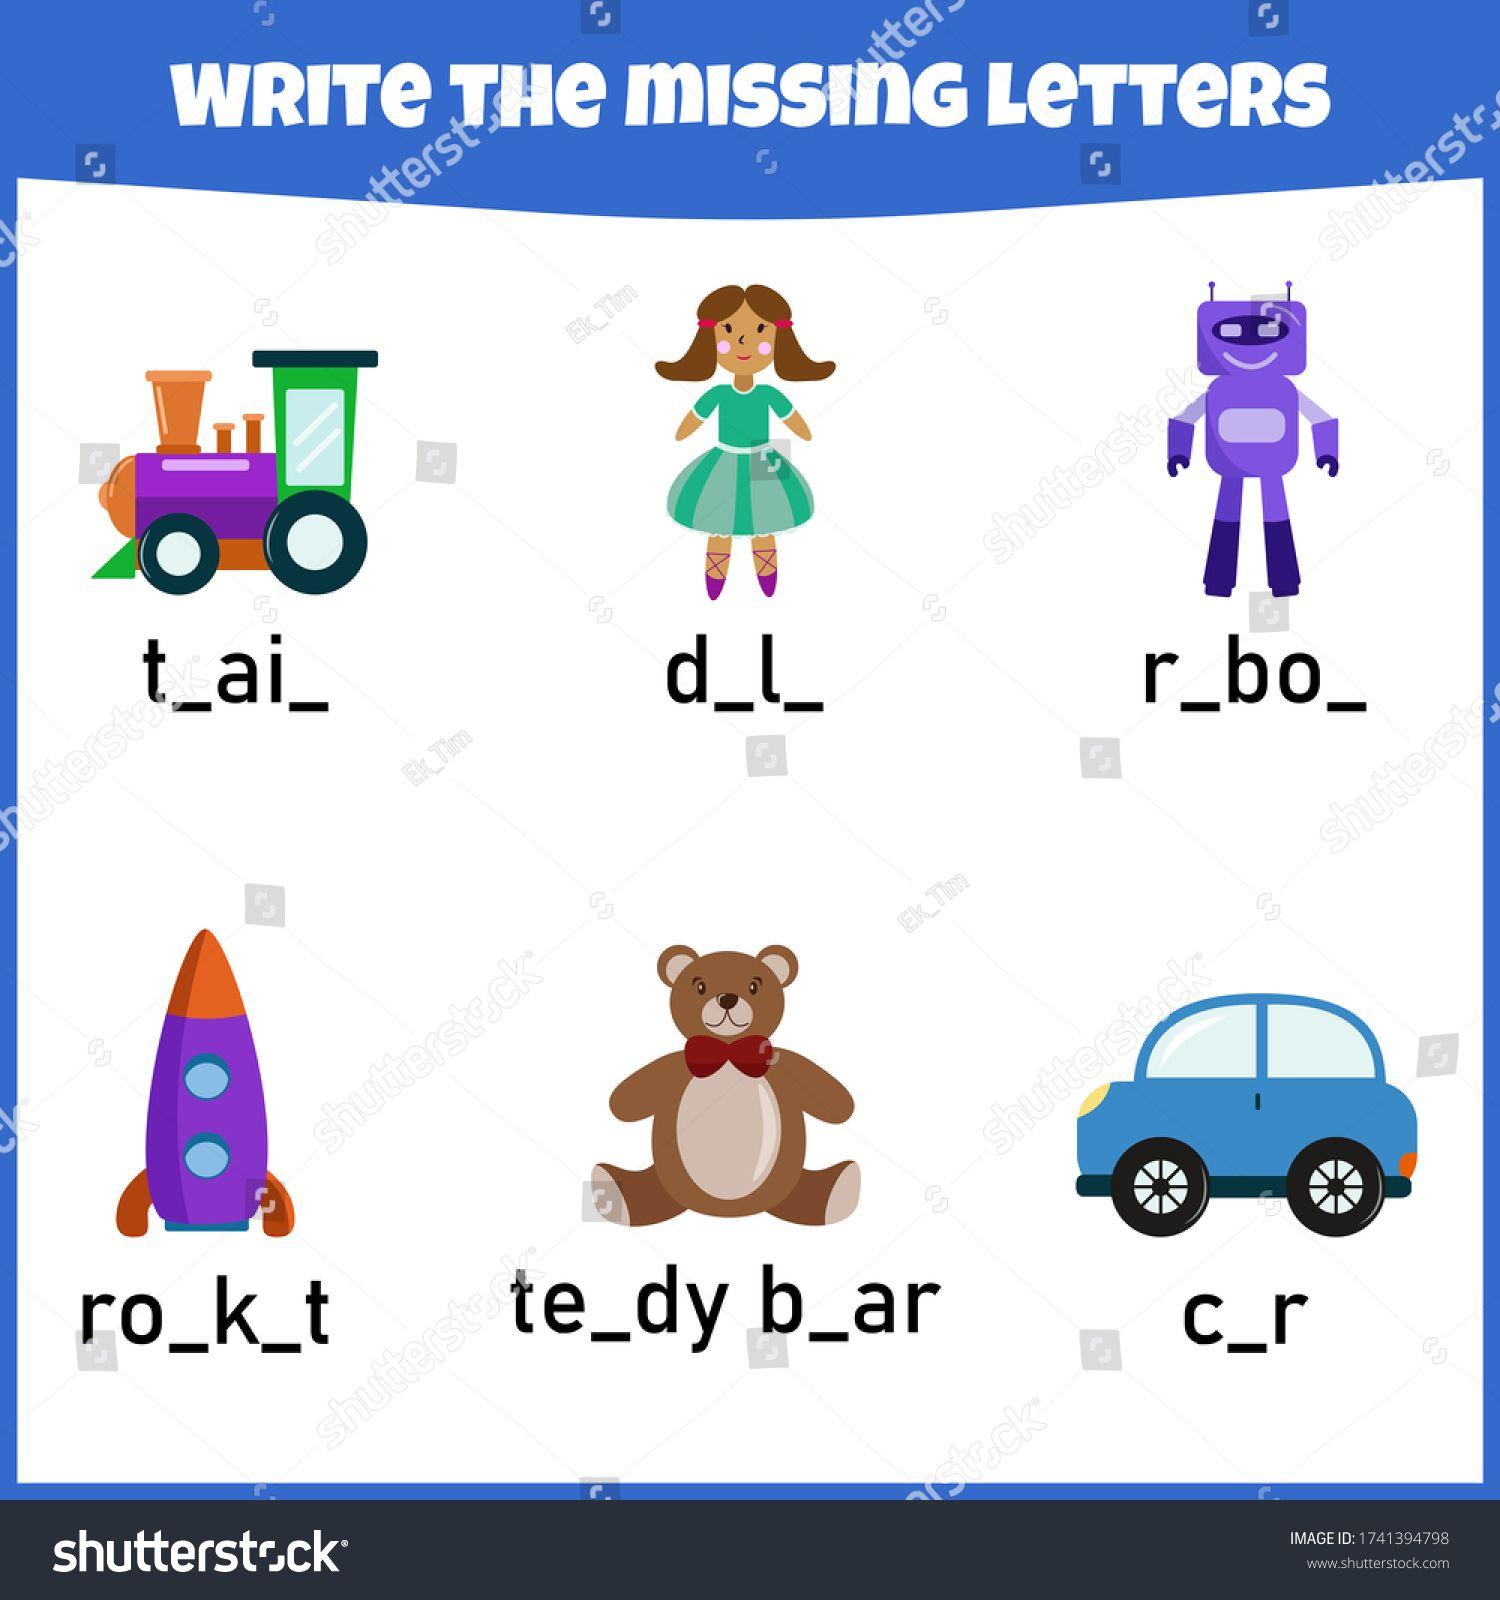 Write The Missing Letter Worksheet For Education Fill In